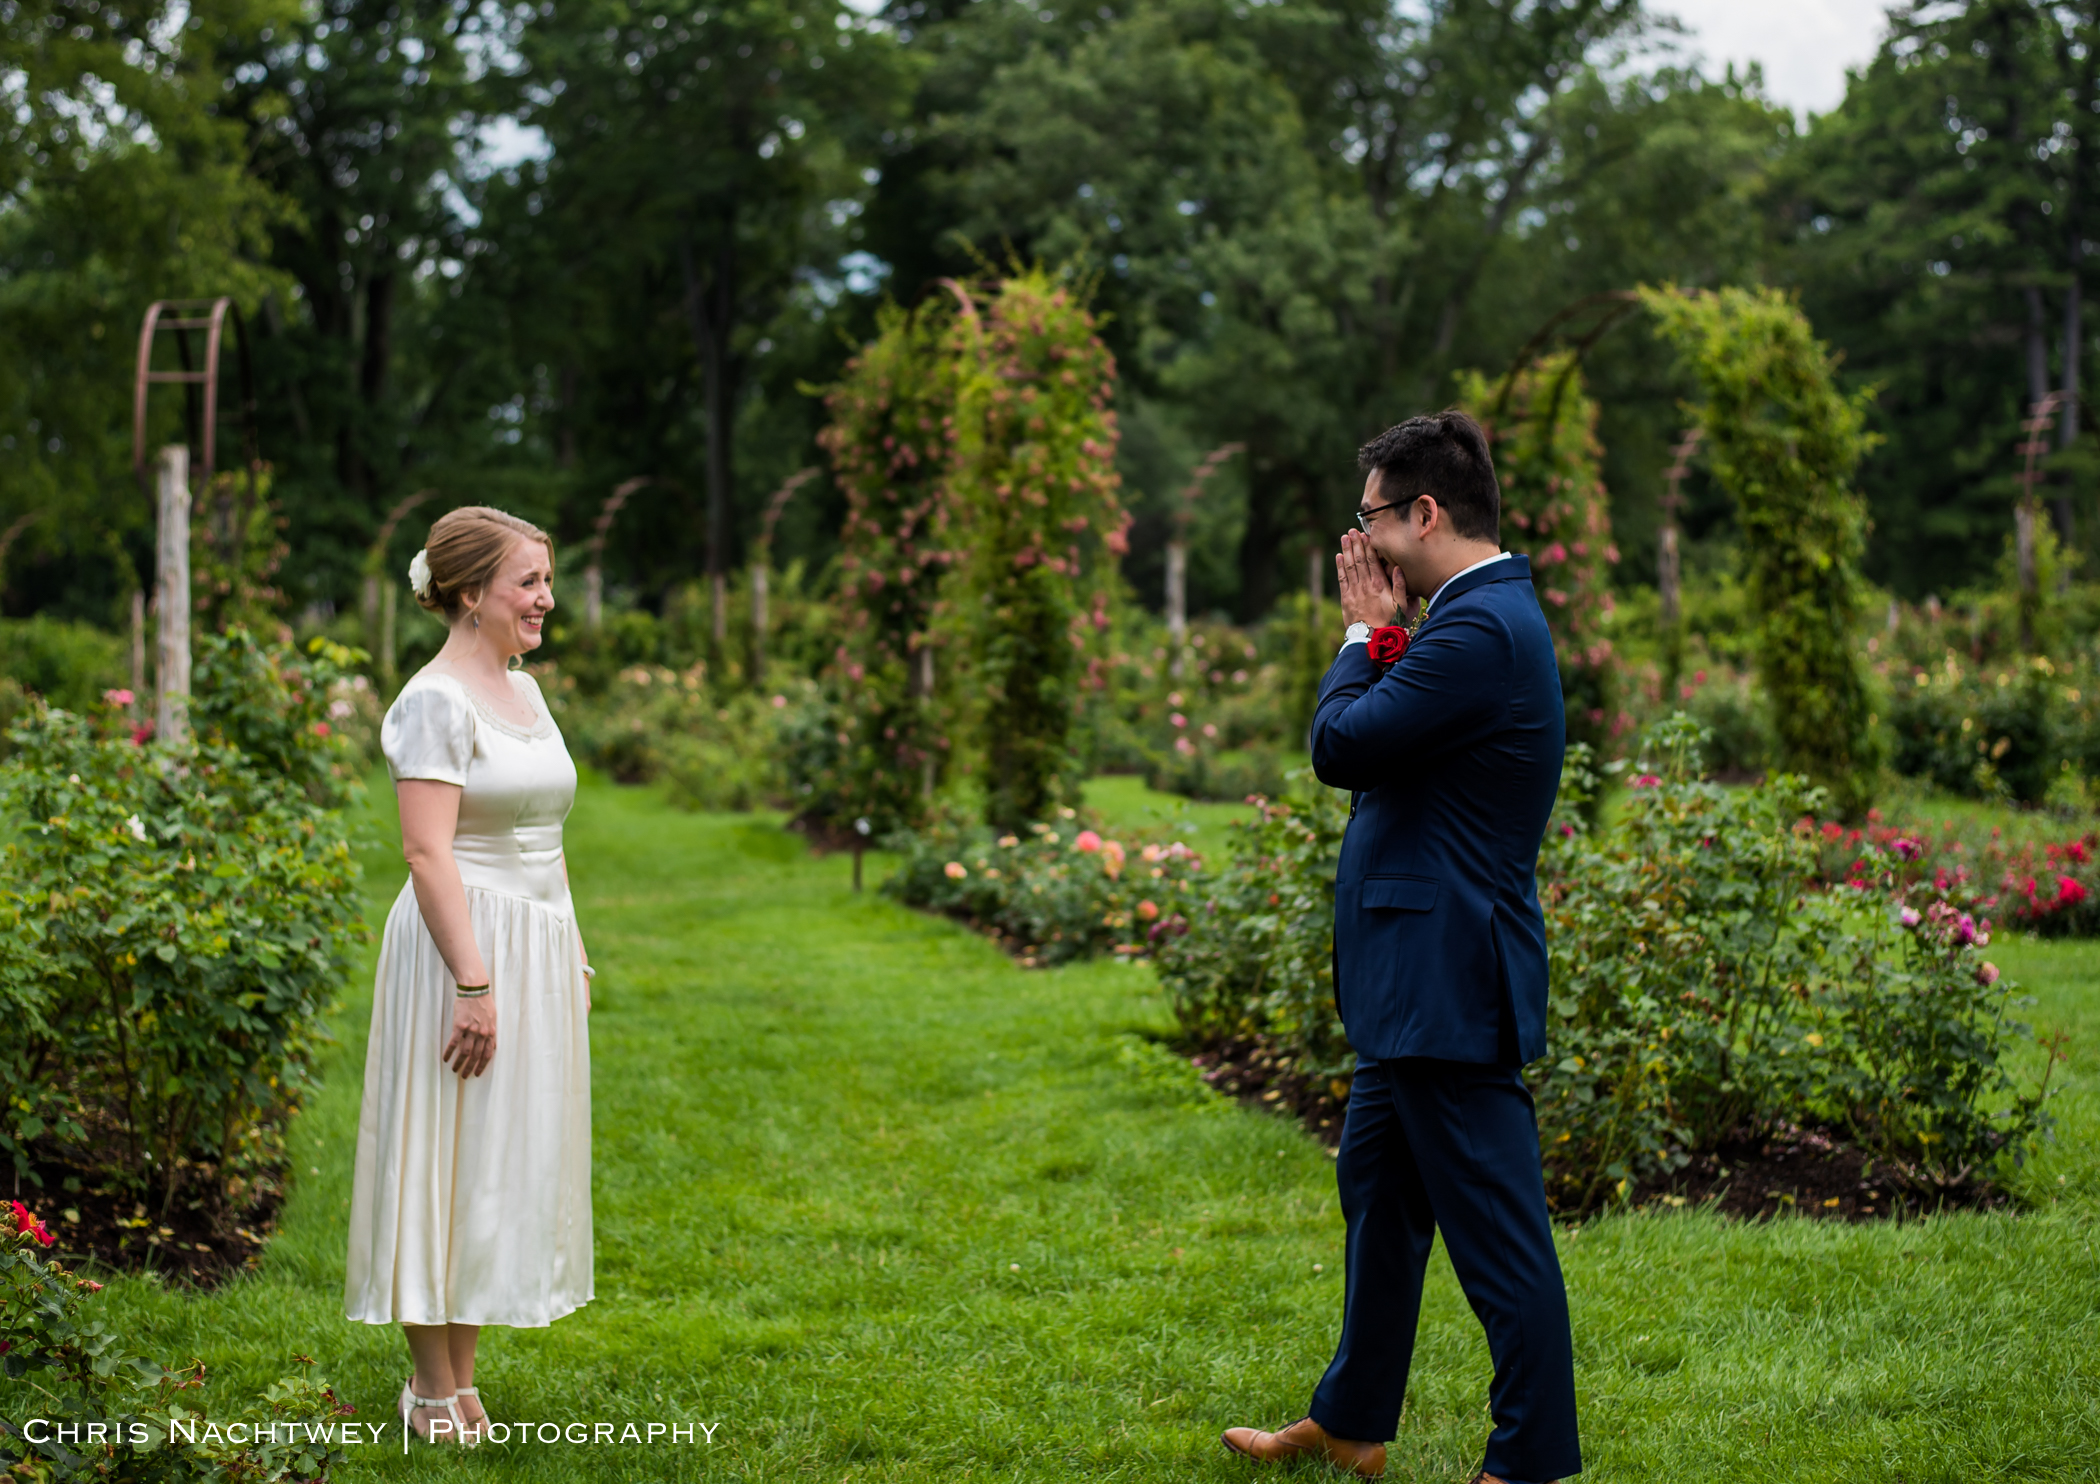 artistic-ct-wedding-photographers-chris-nachtwey-2017-66.jpg